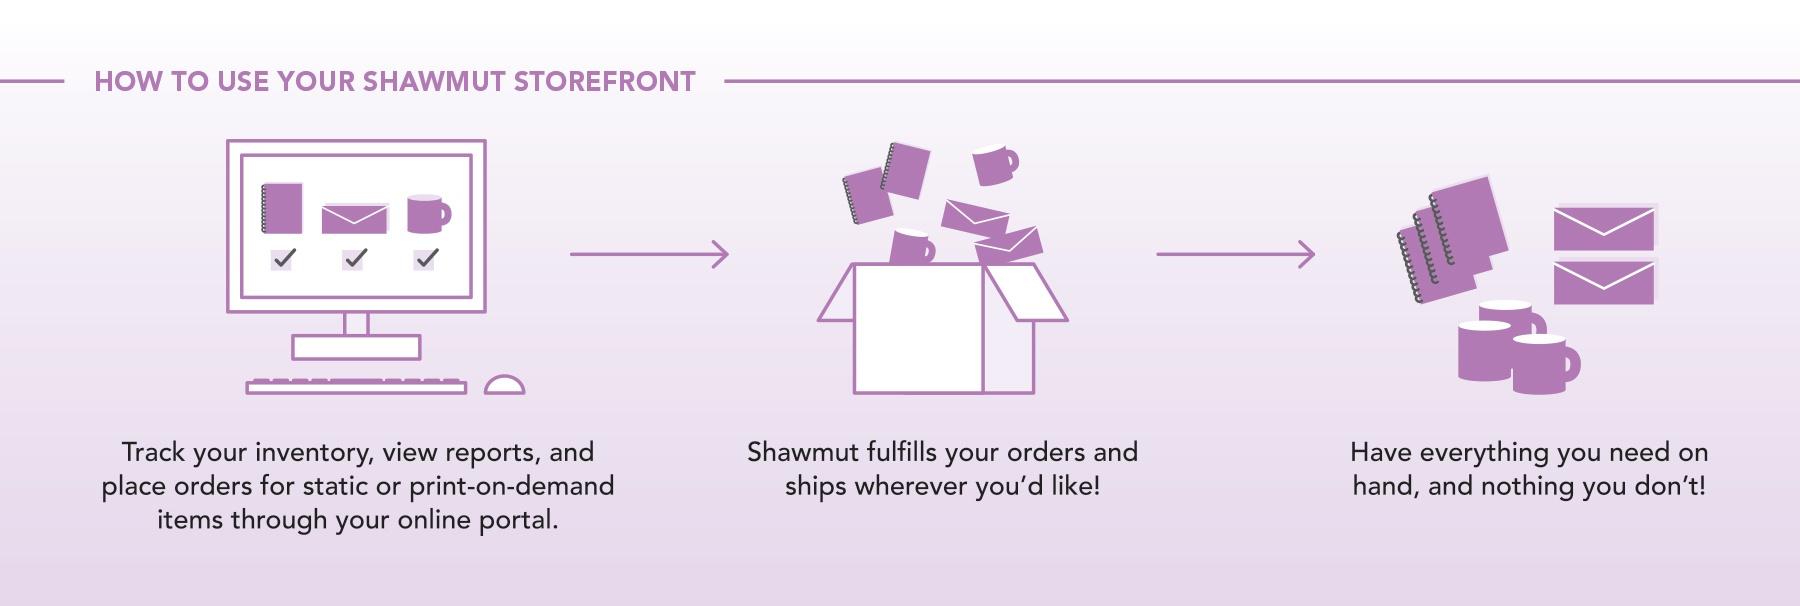 Shawmut-Tactics-SpringCleaning-2